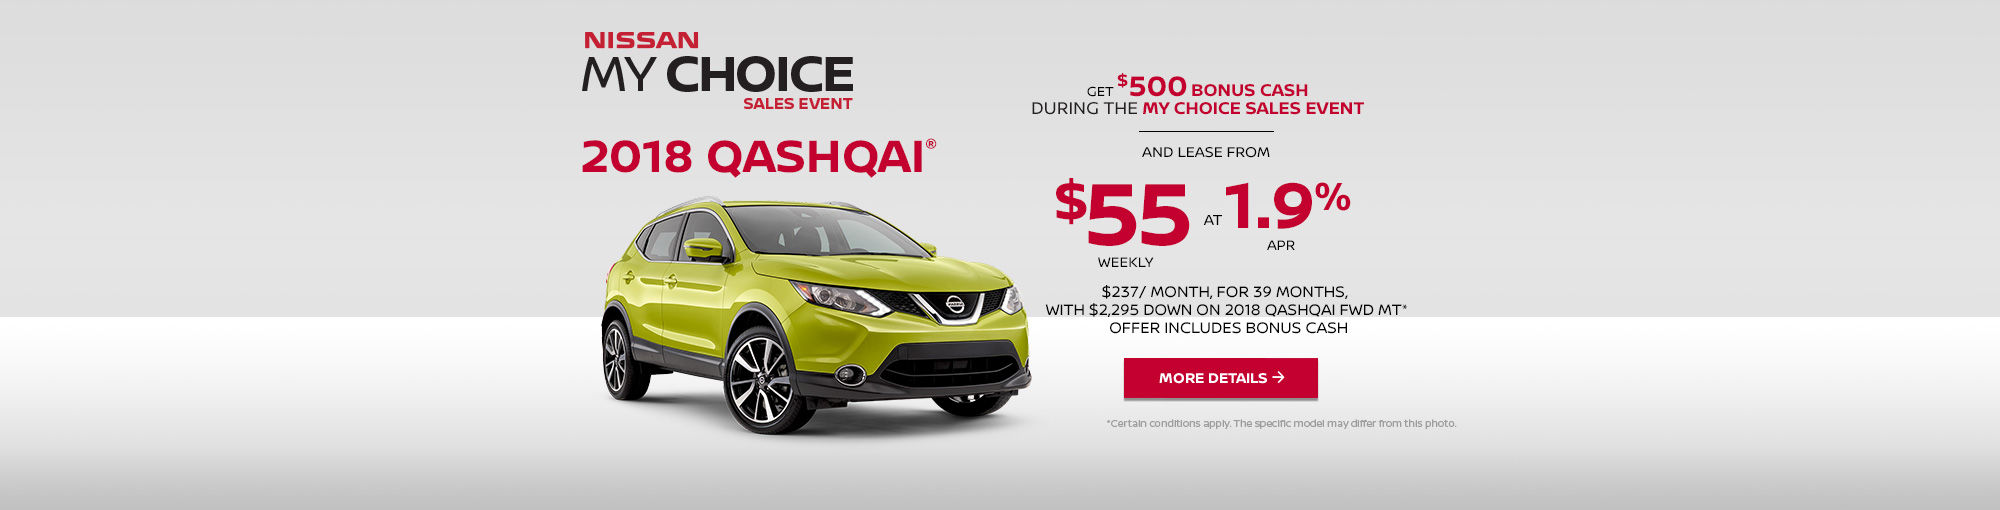 Nissan My Choice Sales Event - Qashqai (web)